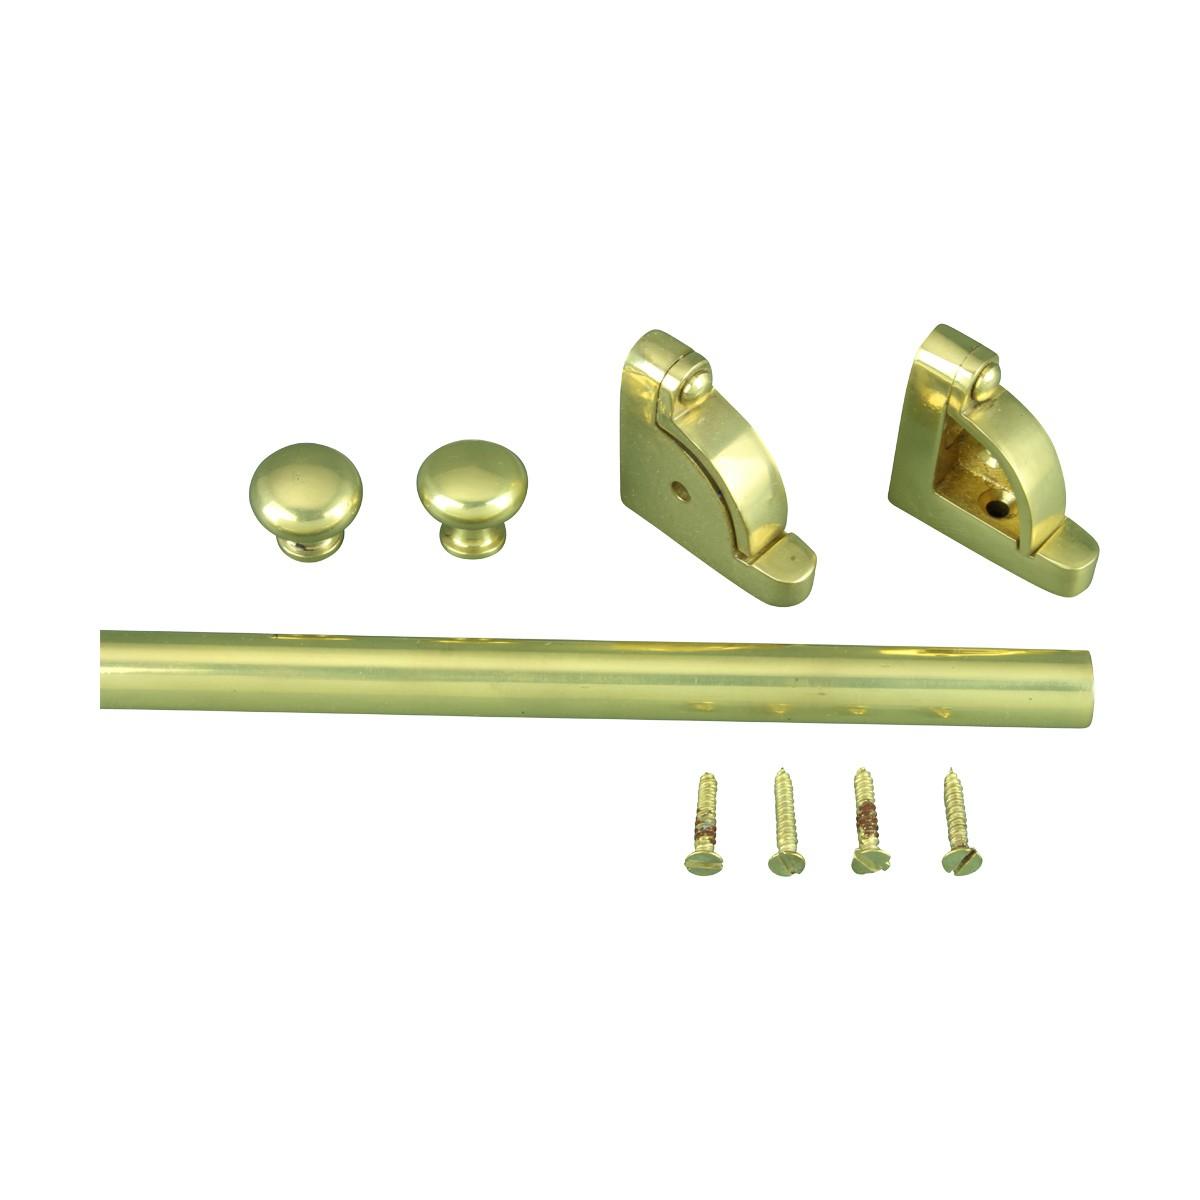 Ball Tip Stair Carpet Rod Set Bright Brass 36 Inch L 1 2